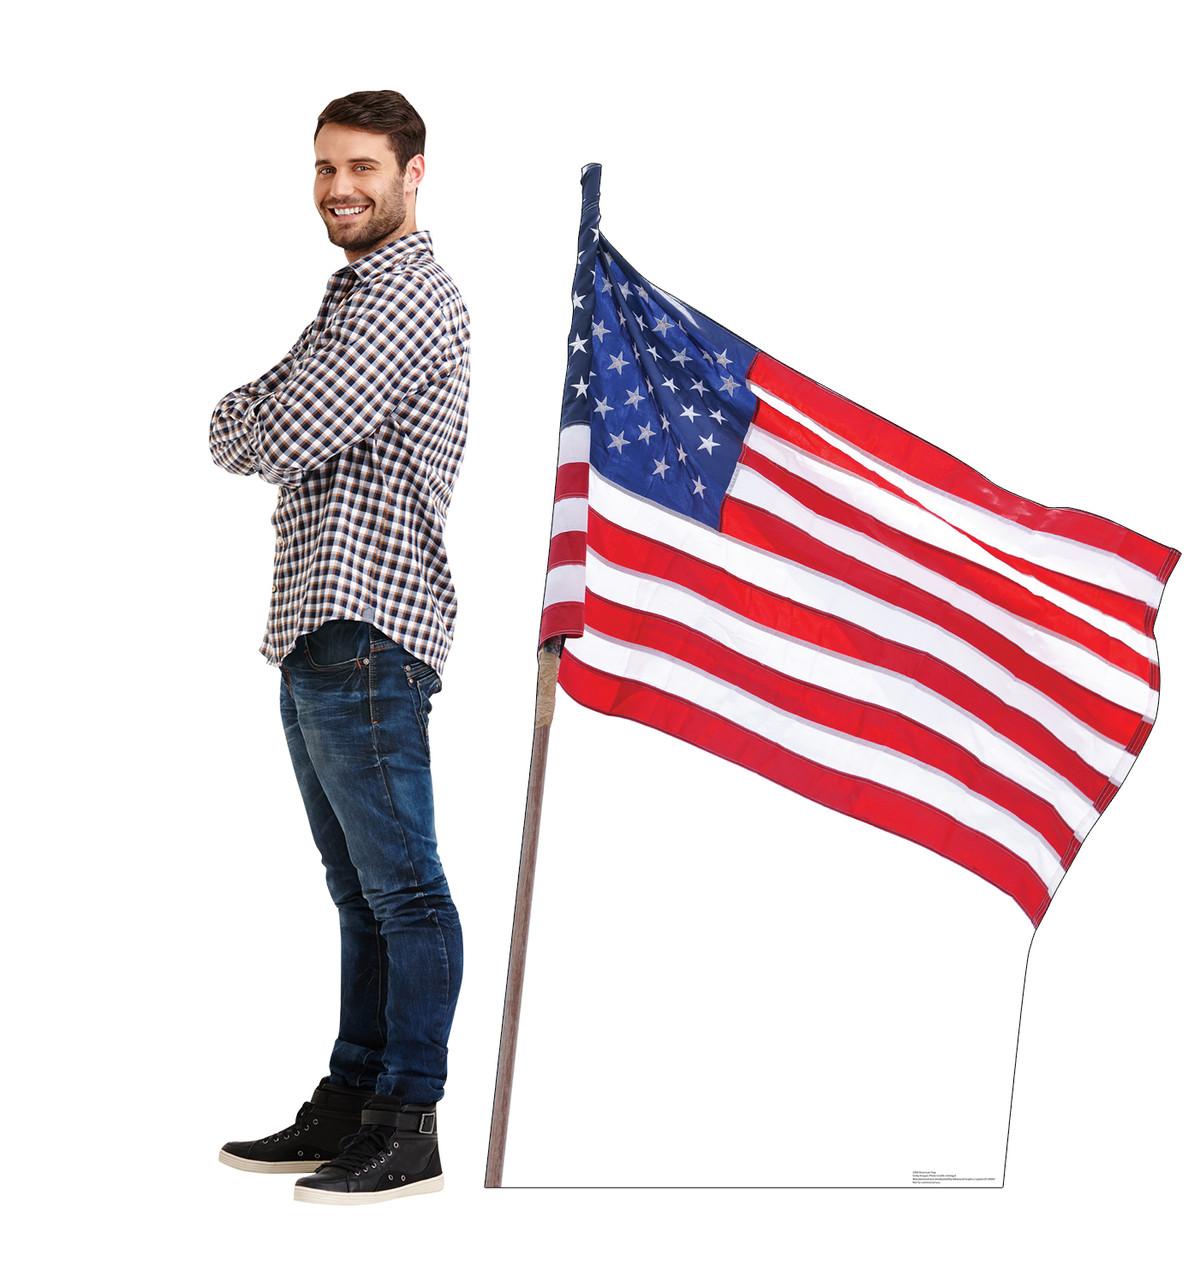 Cardboard standee of the American Flag Lifesize